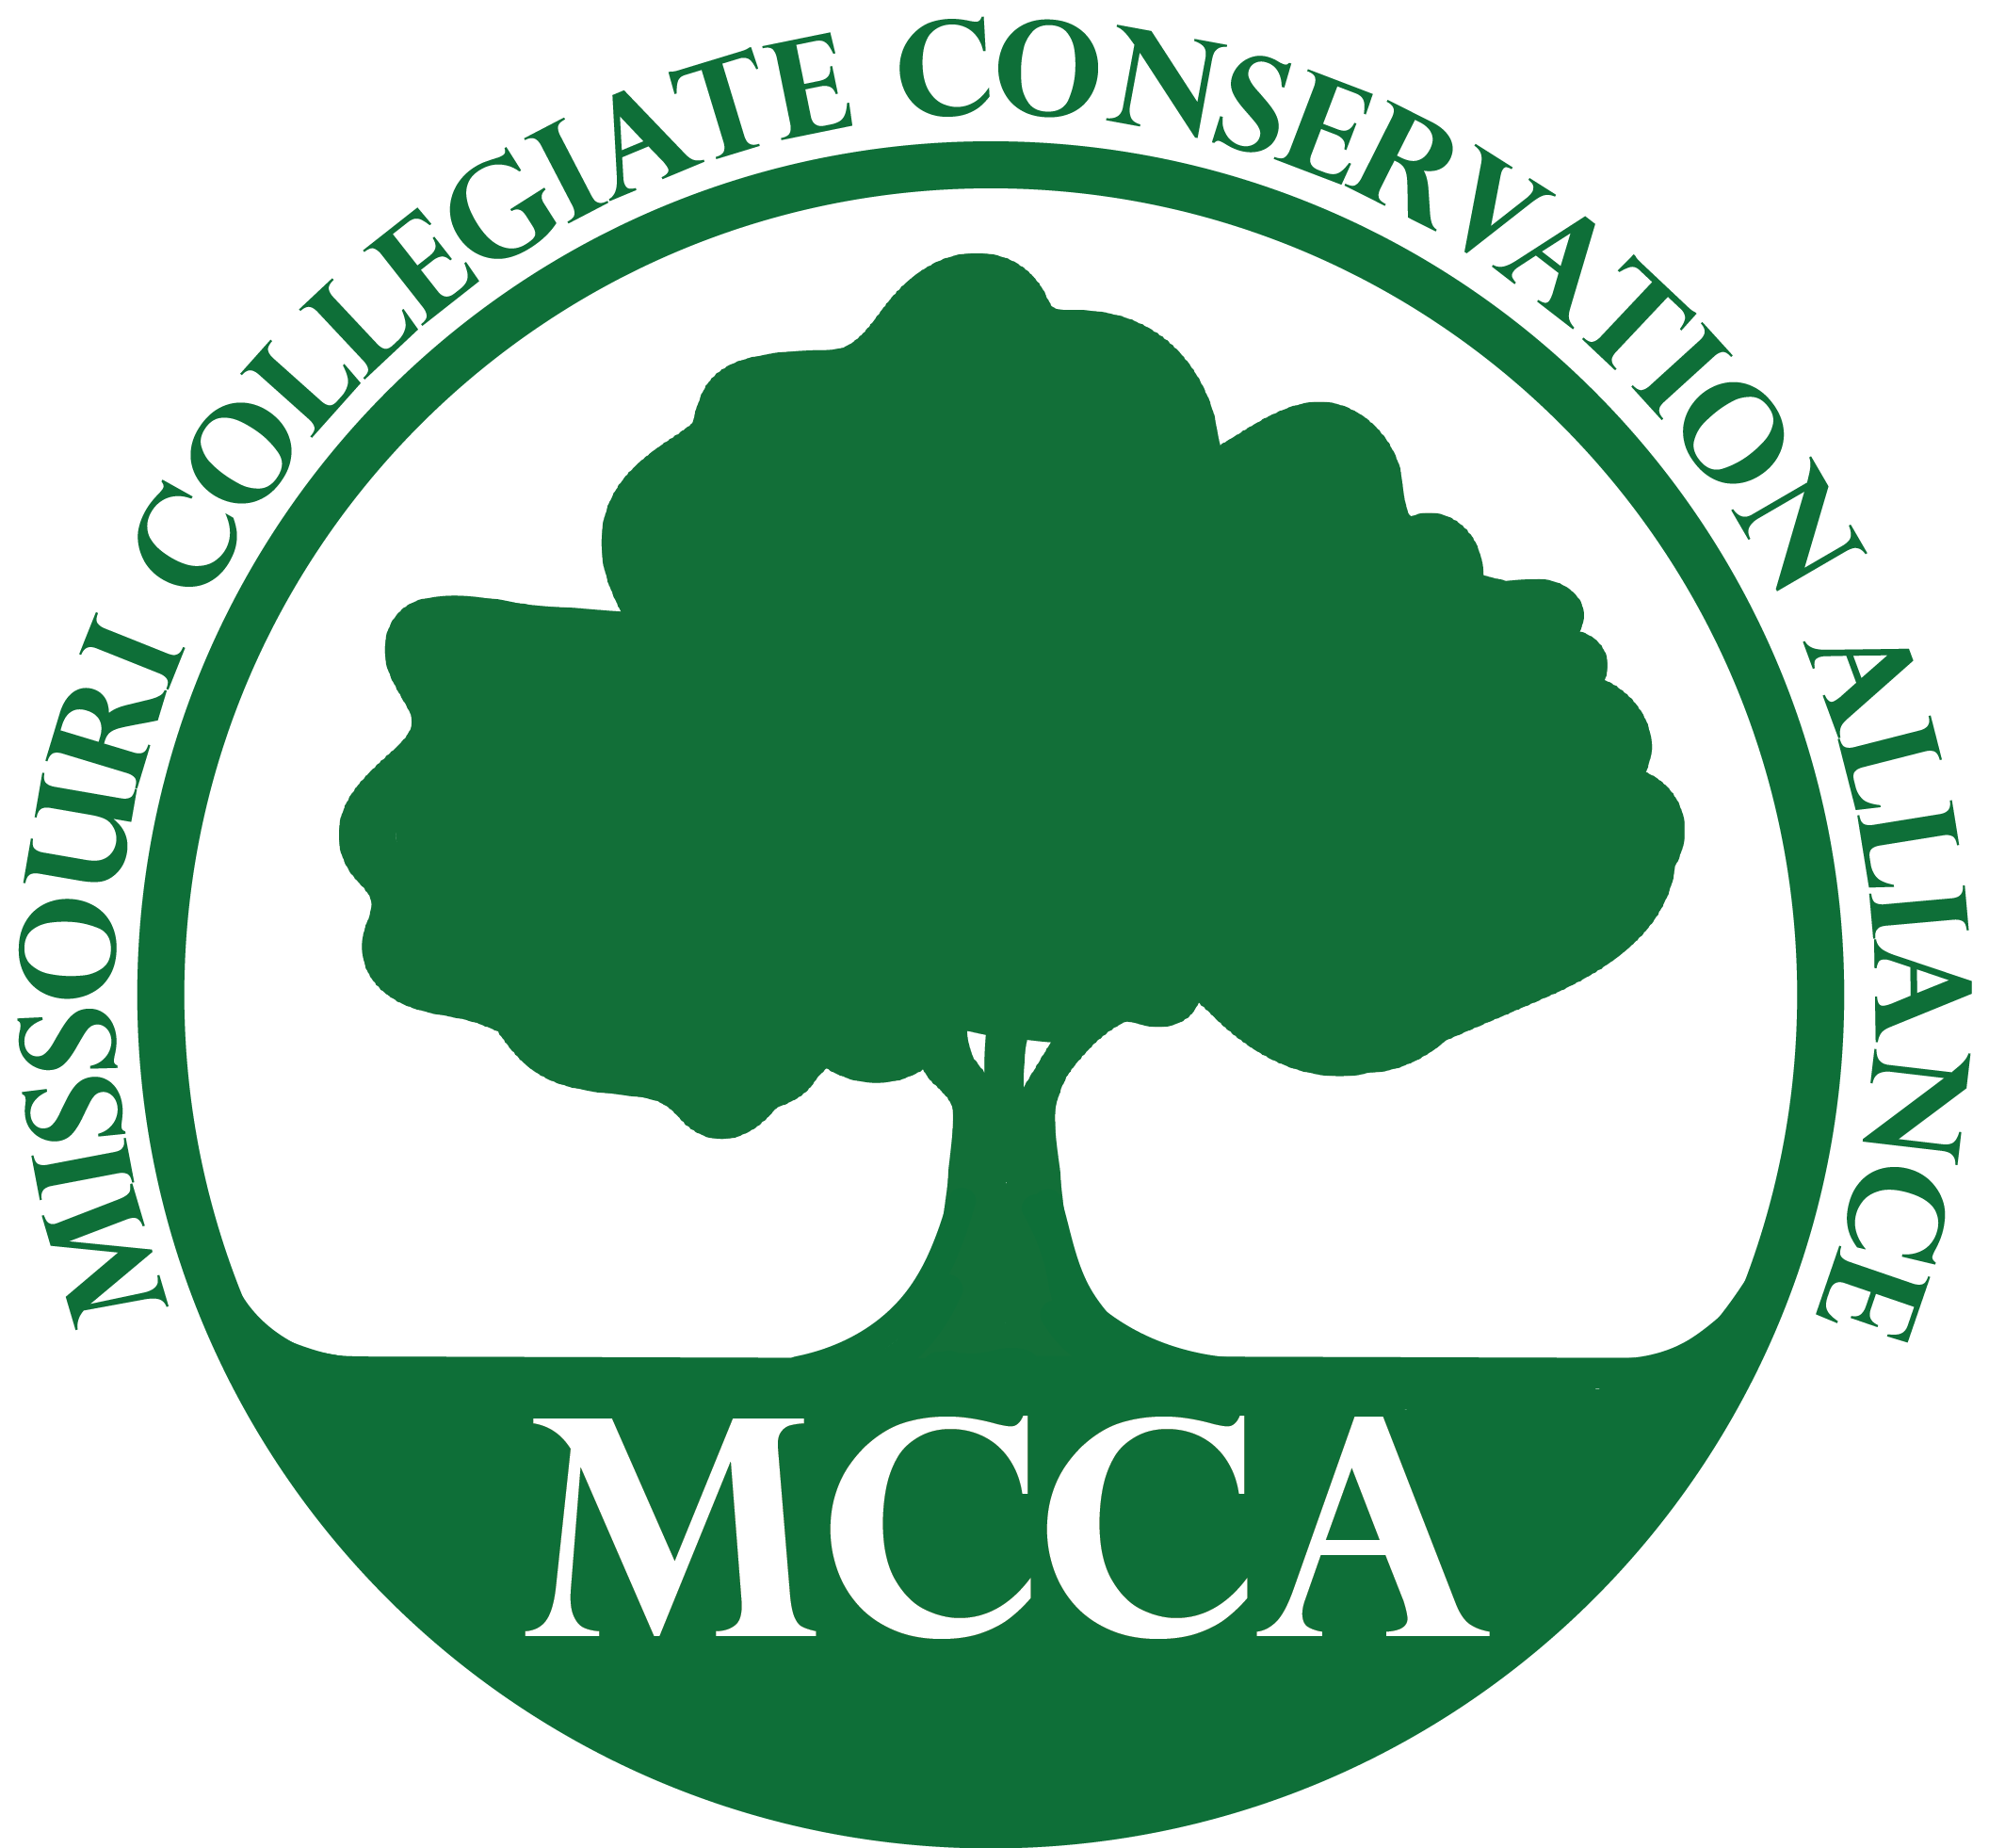 MCCA logo 3